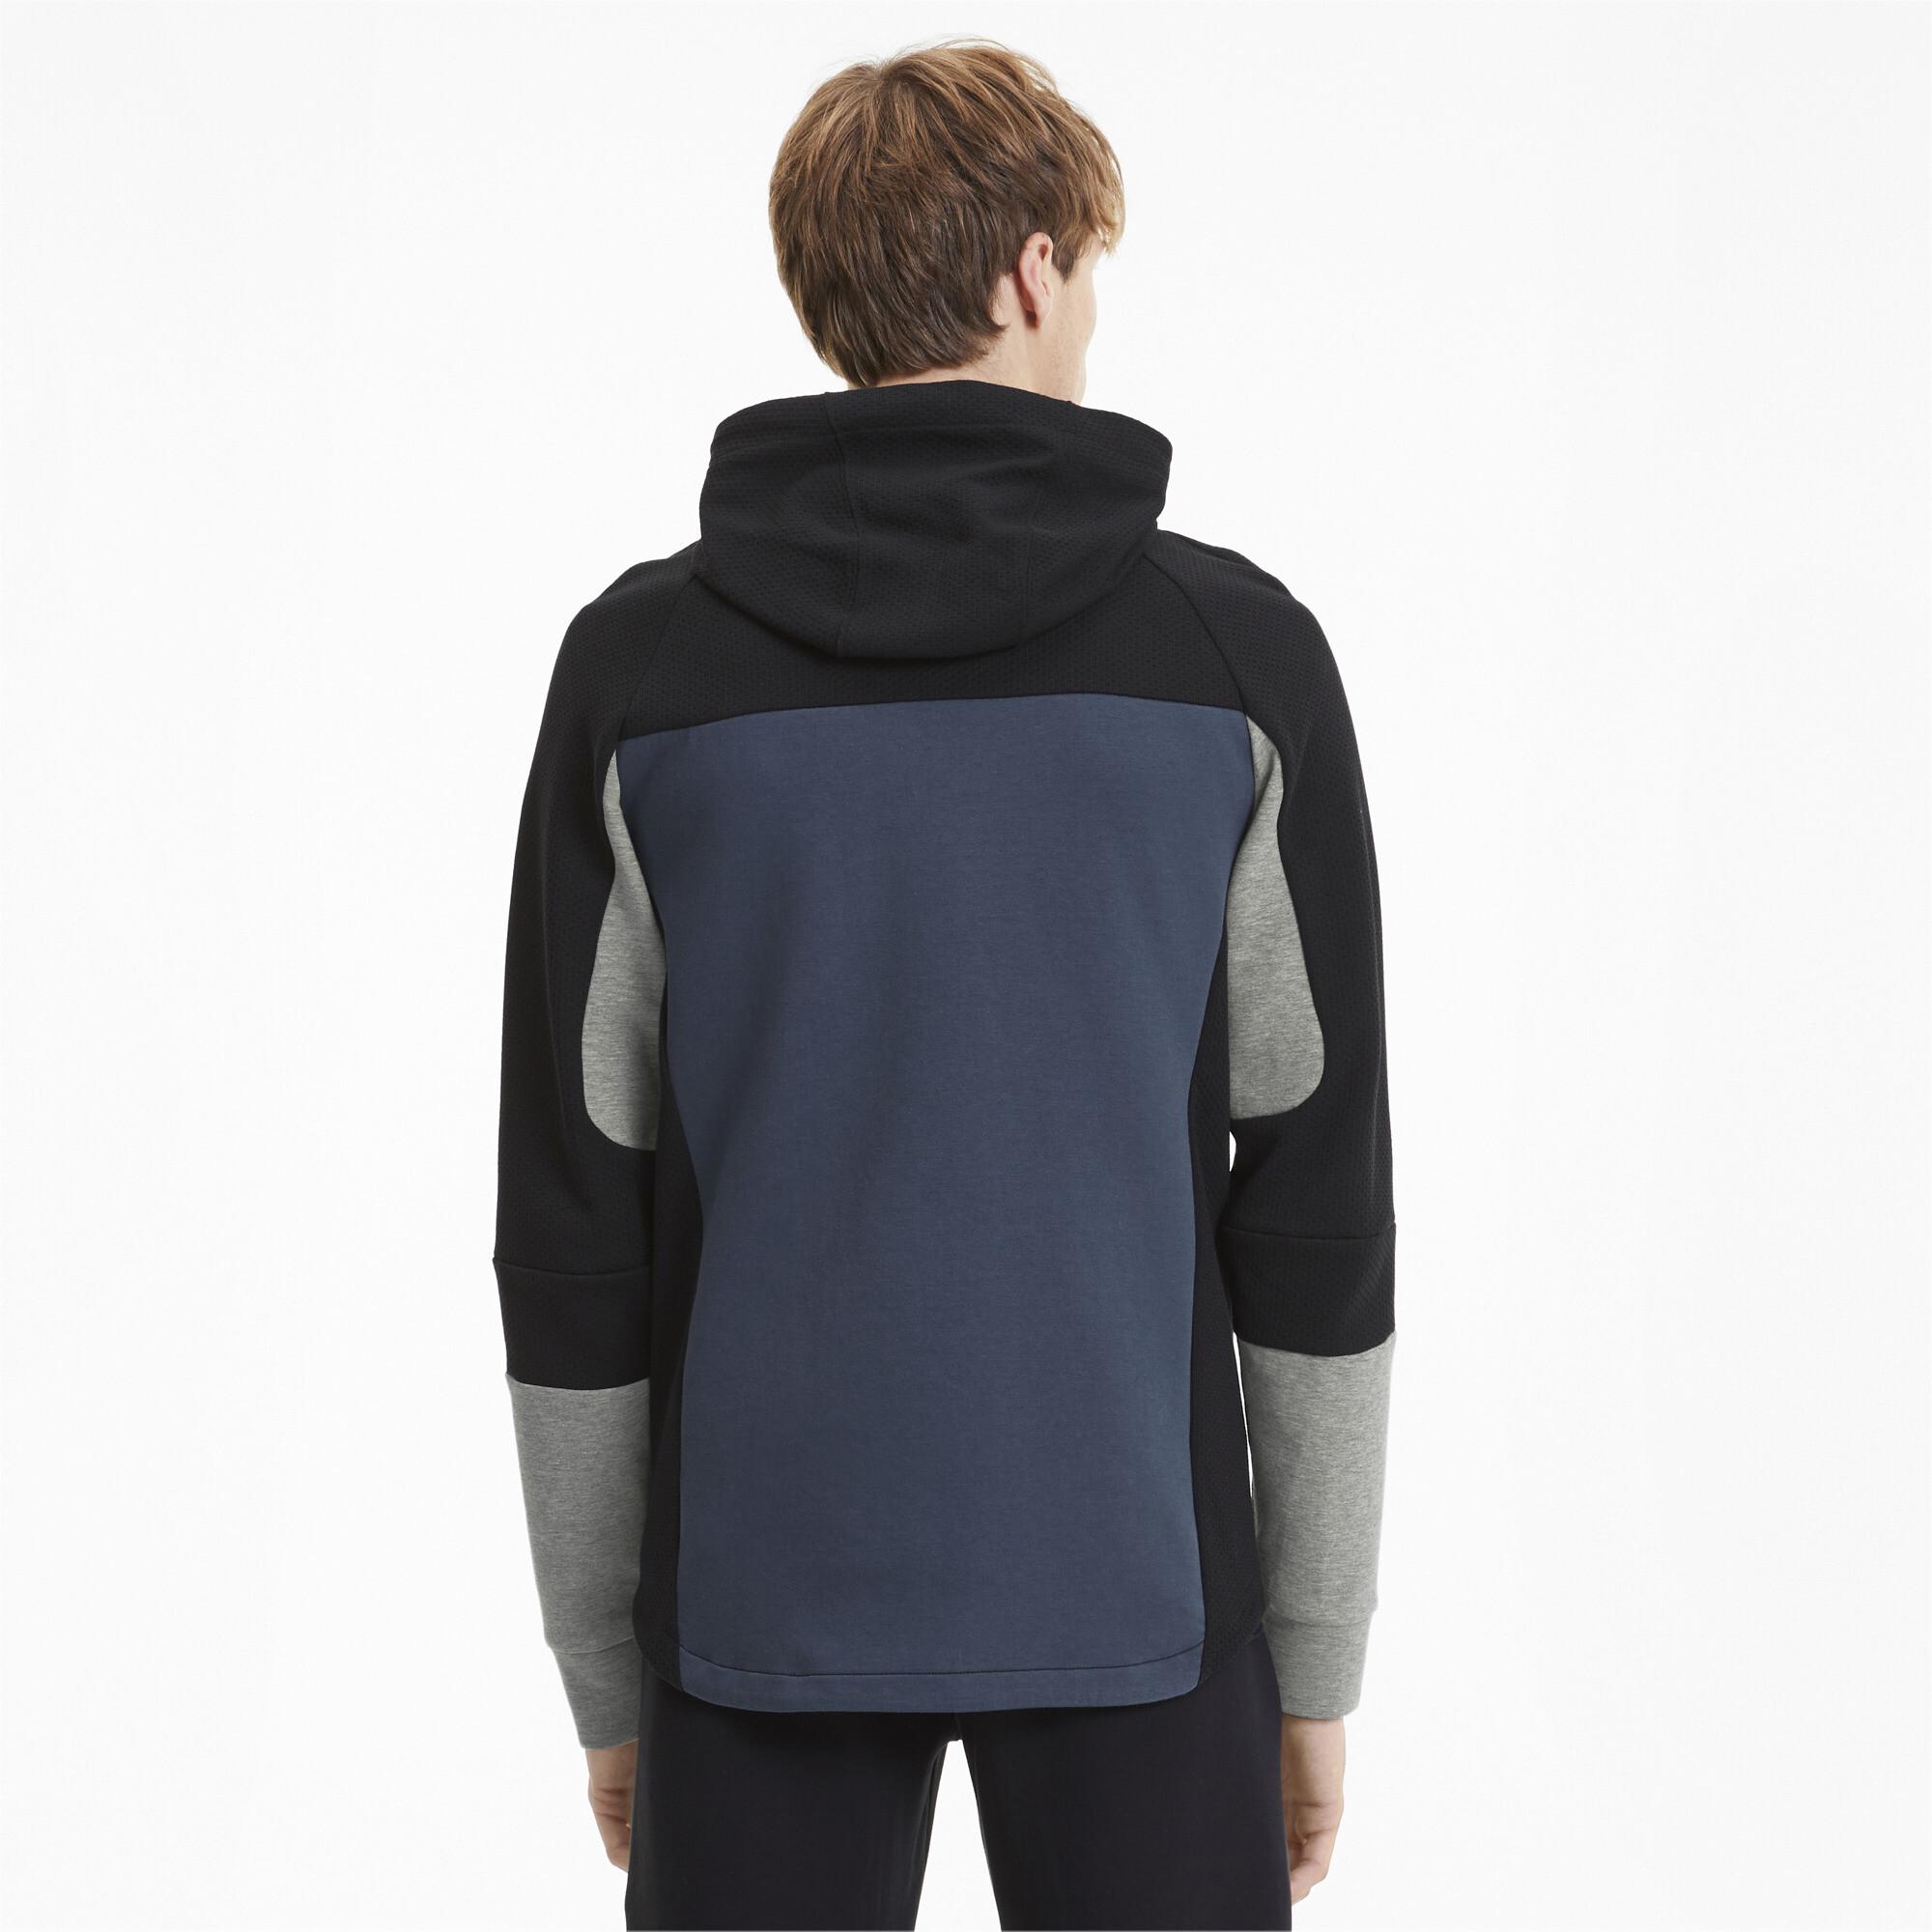 PUMA-Evostripe-Men-039-s-Hooded-Jacket-Men-Sweat-Basics thumbnail 5